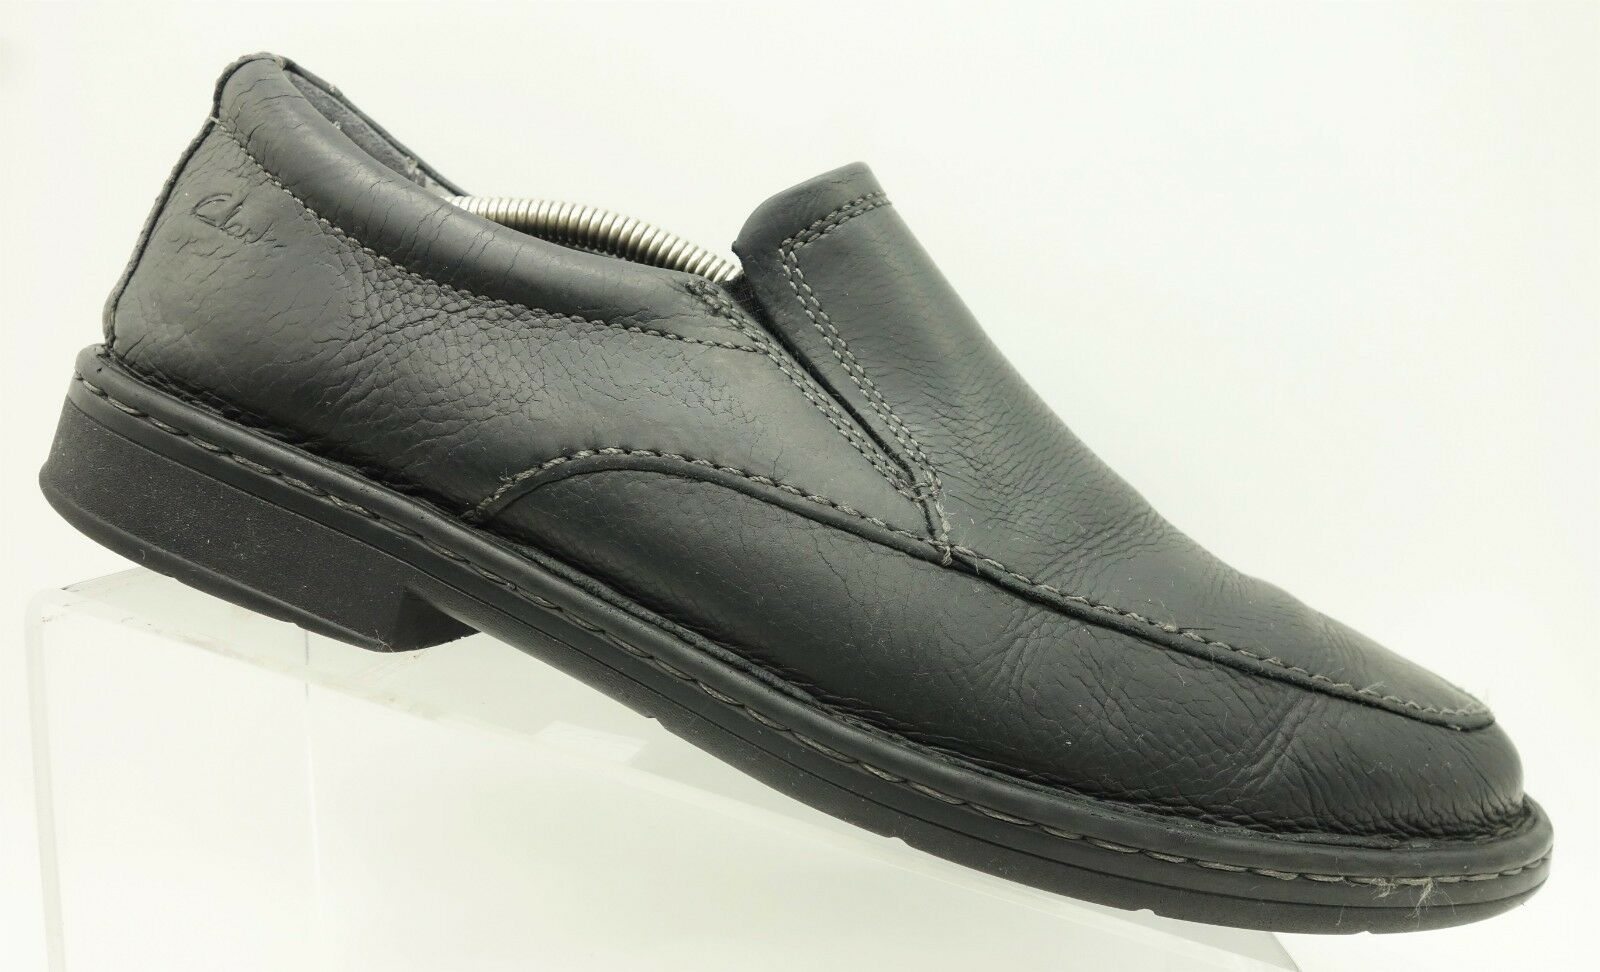 Clarks Wave Black Leather Casual Comfort Slip On Loafer shoes Men's 11.5 M